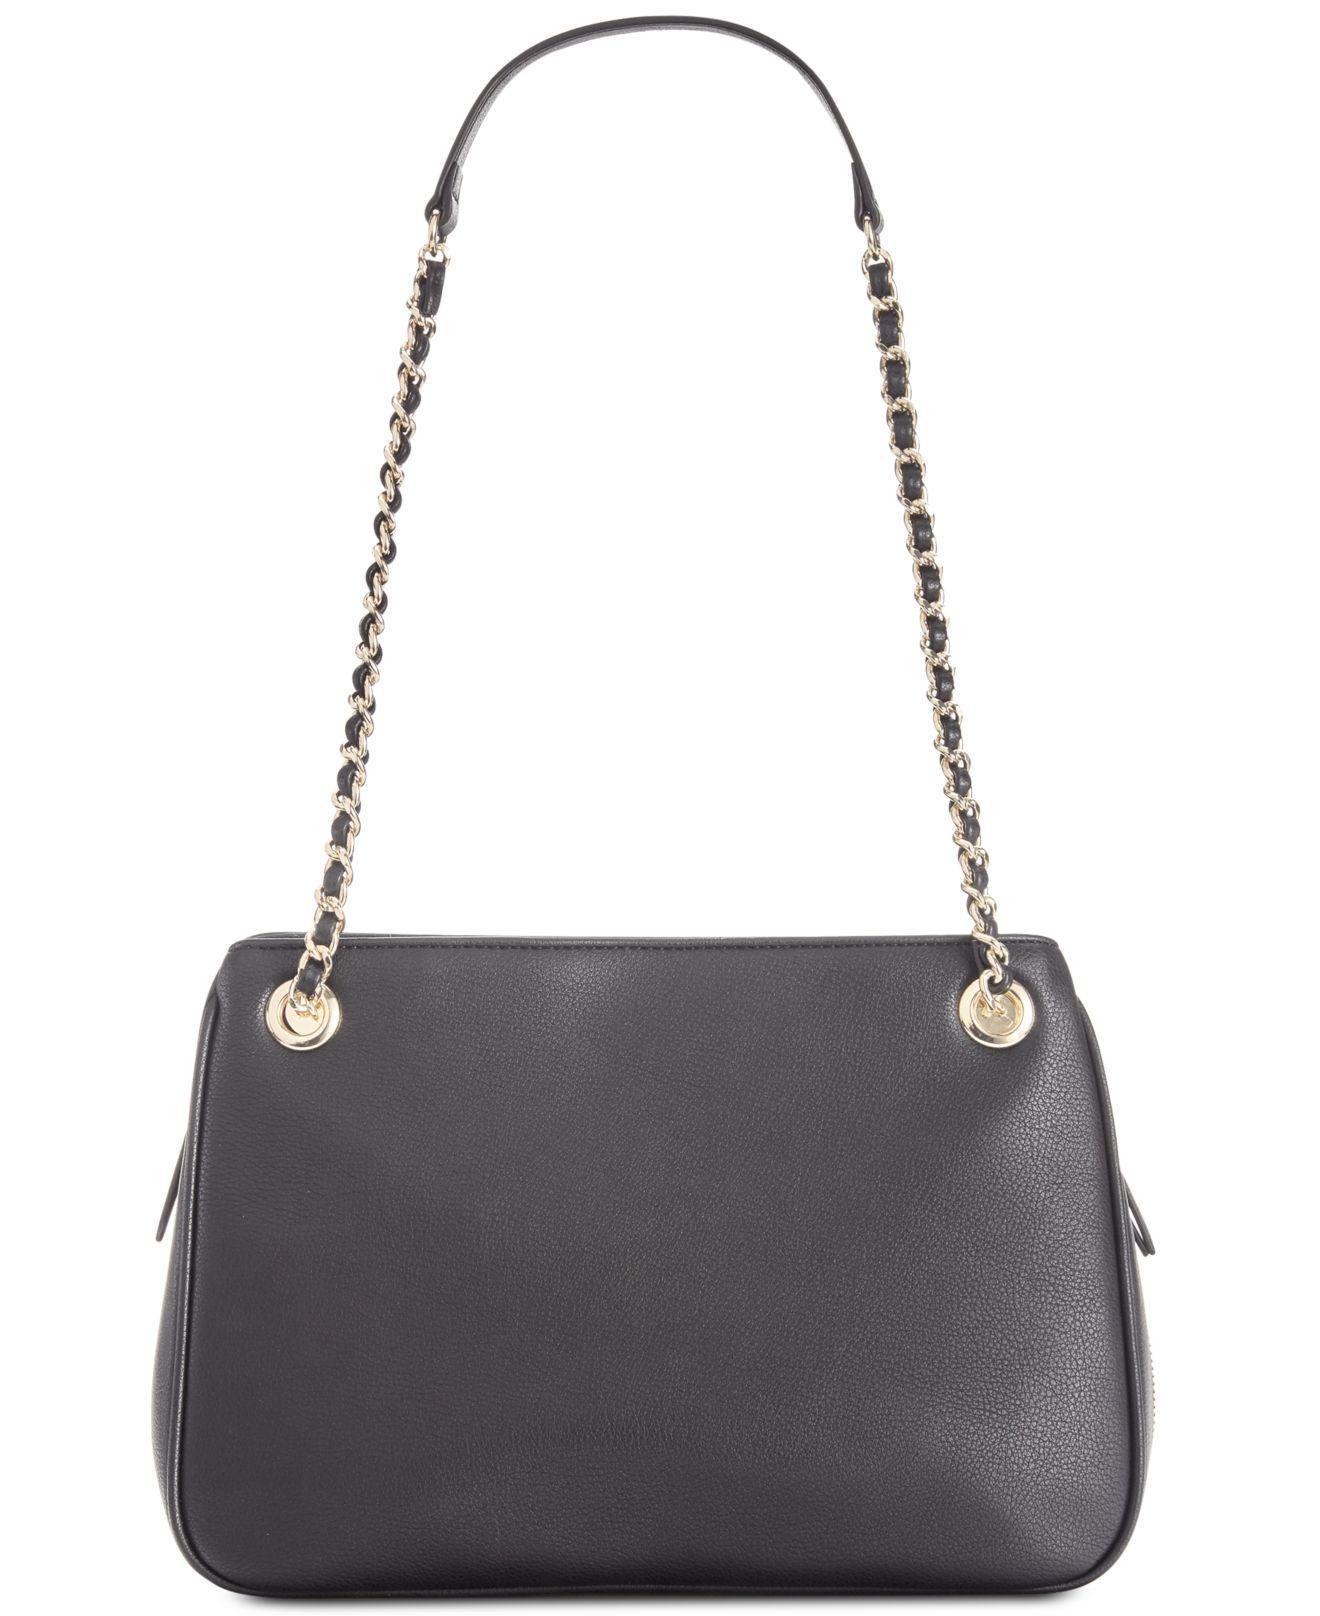 d02cef728a41 Lyst - INC International Concepts I.n.c. Deliz Chain Shoulder Bag ...